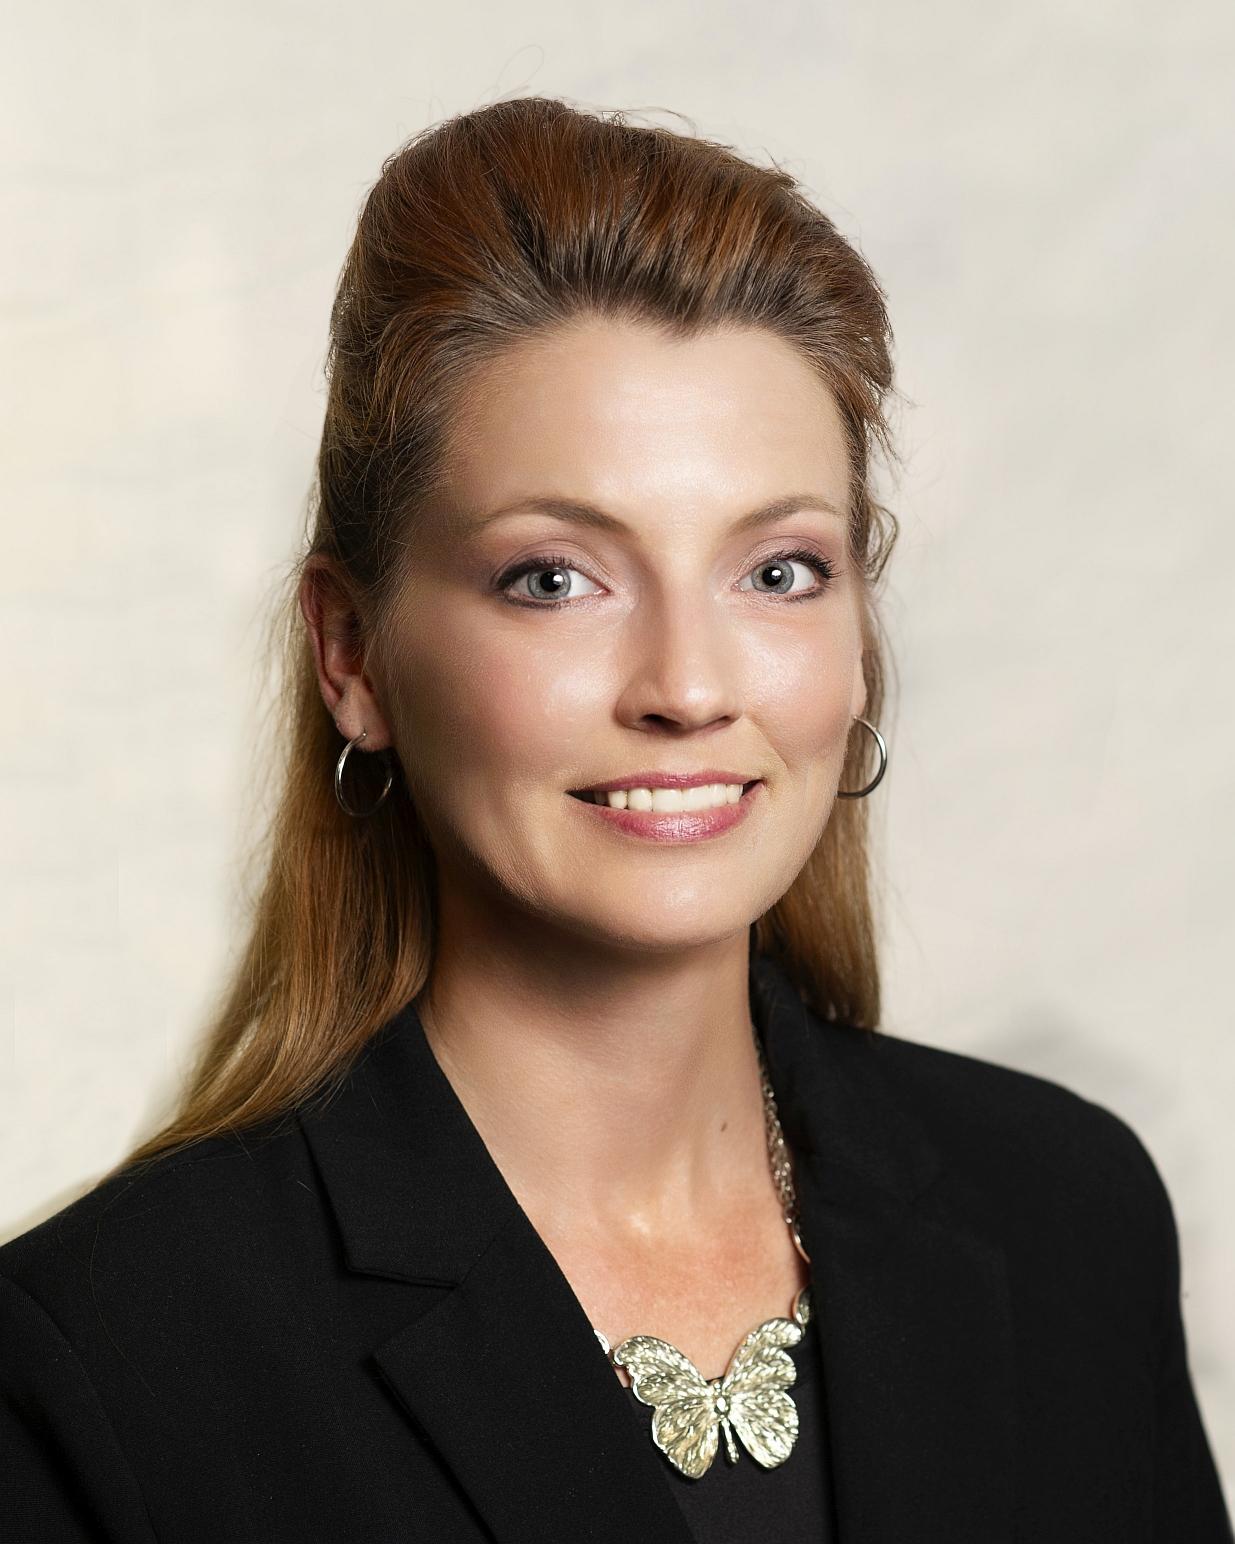 Heidi Bringhurst